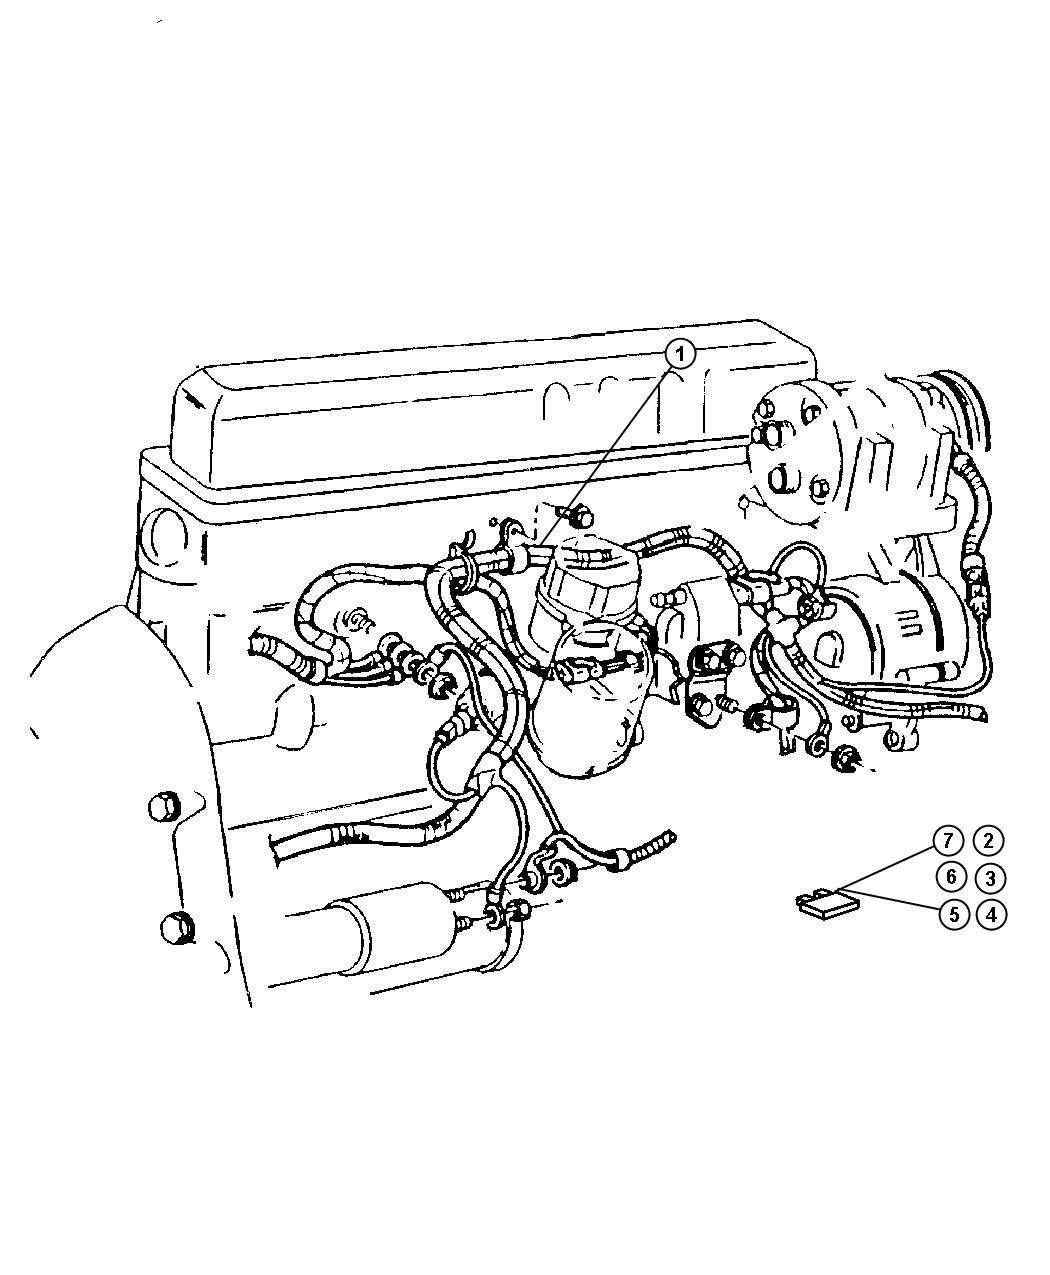 Chrysler 200 Fuse. Maxi. 30 amp, green. Wamplified